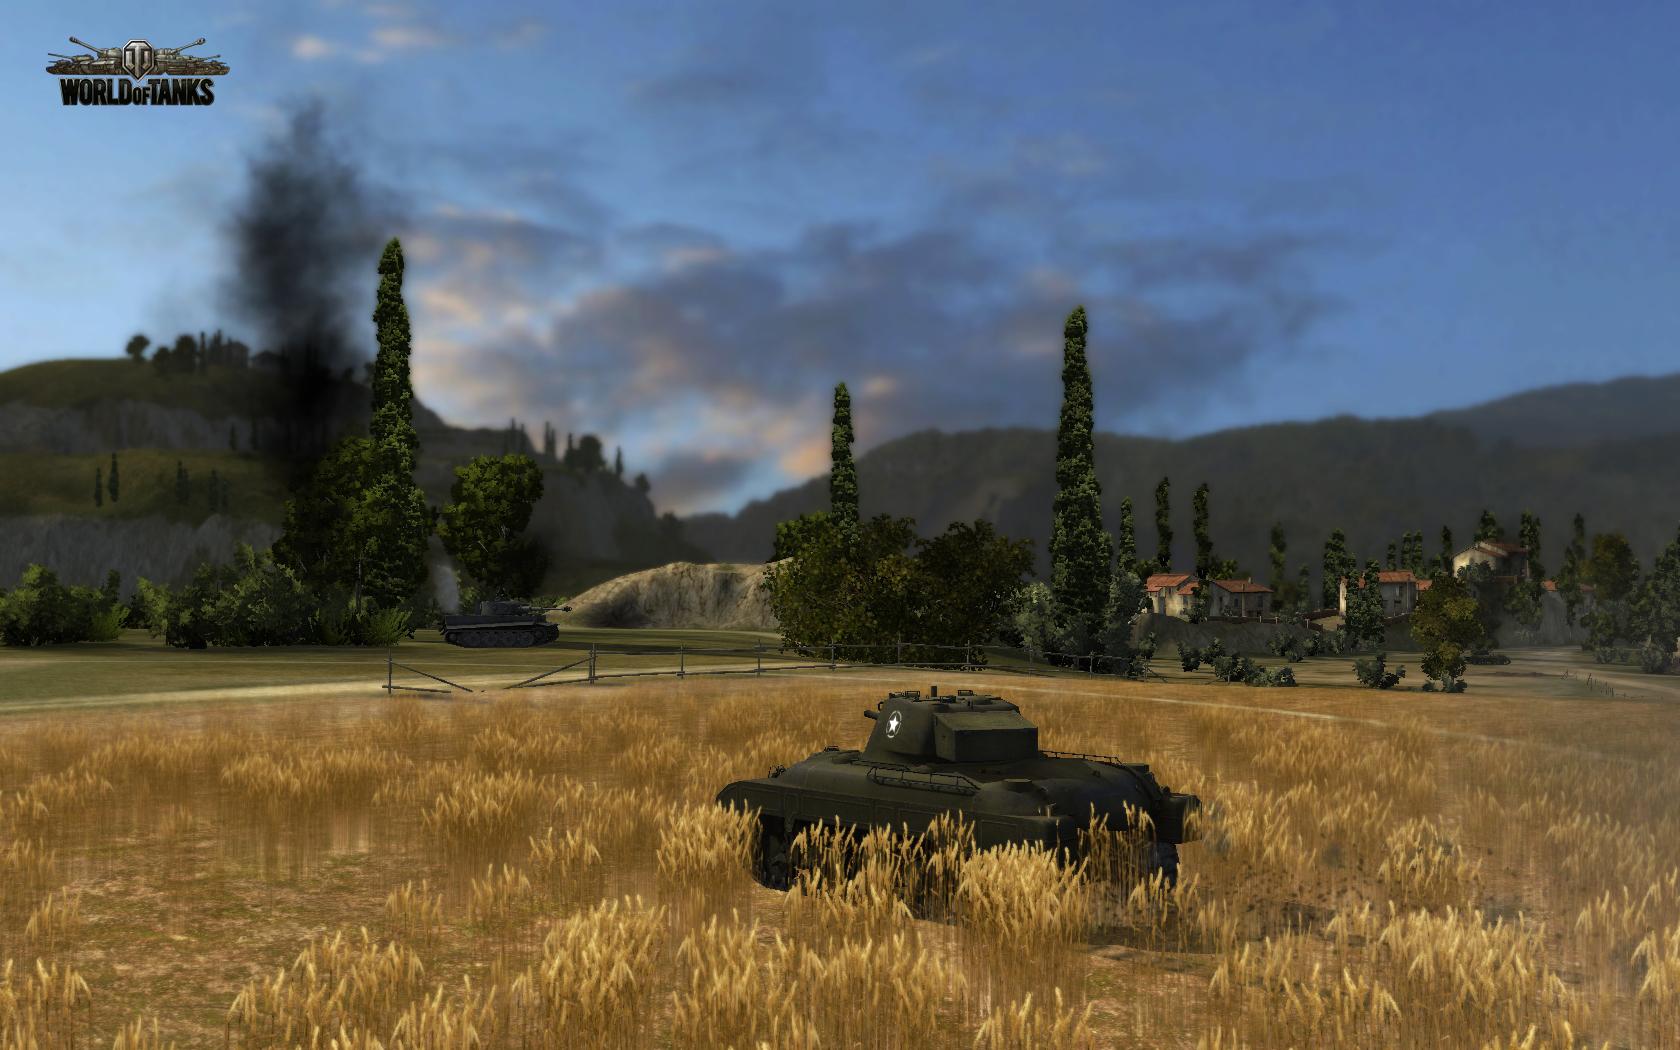 Click image for larger version.Name:World of Tanks 32.jpgViews:188Size:1.08 MBID:1622